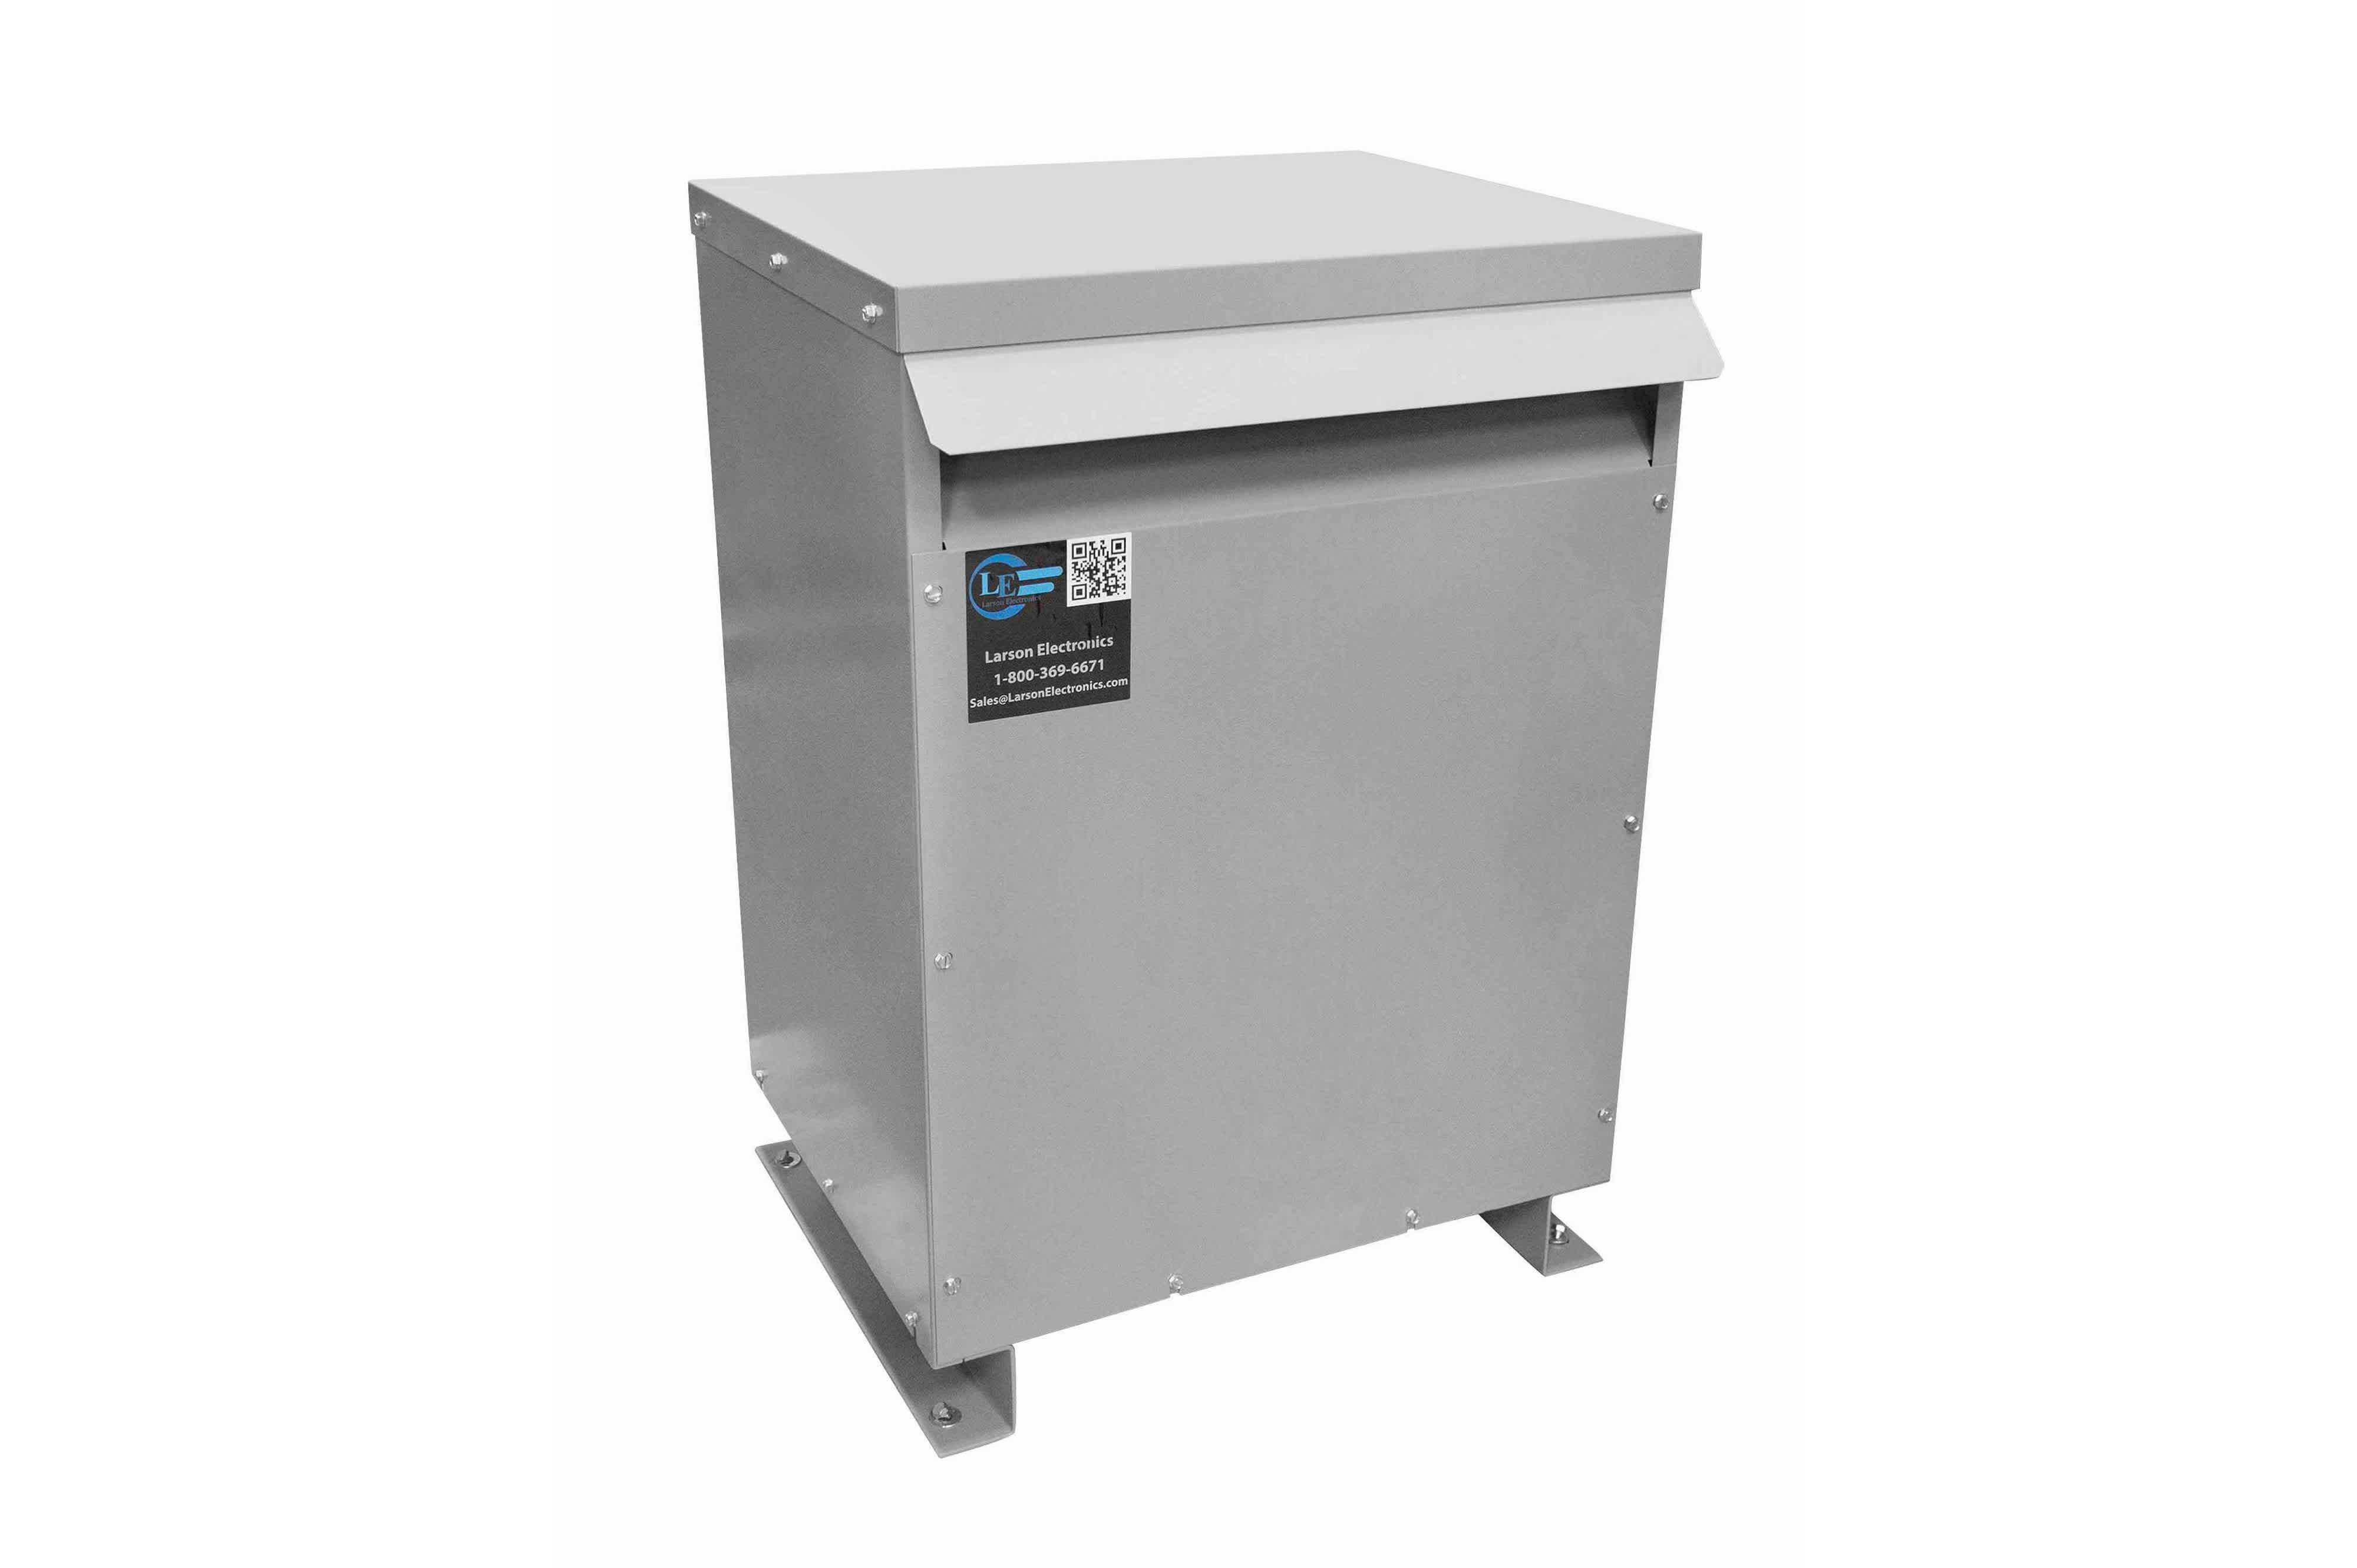 38 kVA 3PH Isolation Transformer, 208V Wye Primary, 208V Delta Secondary, N3R, Ventilated, 60 Hz